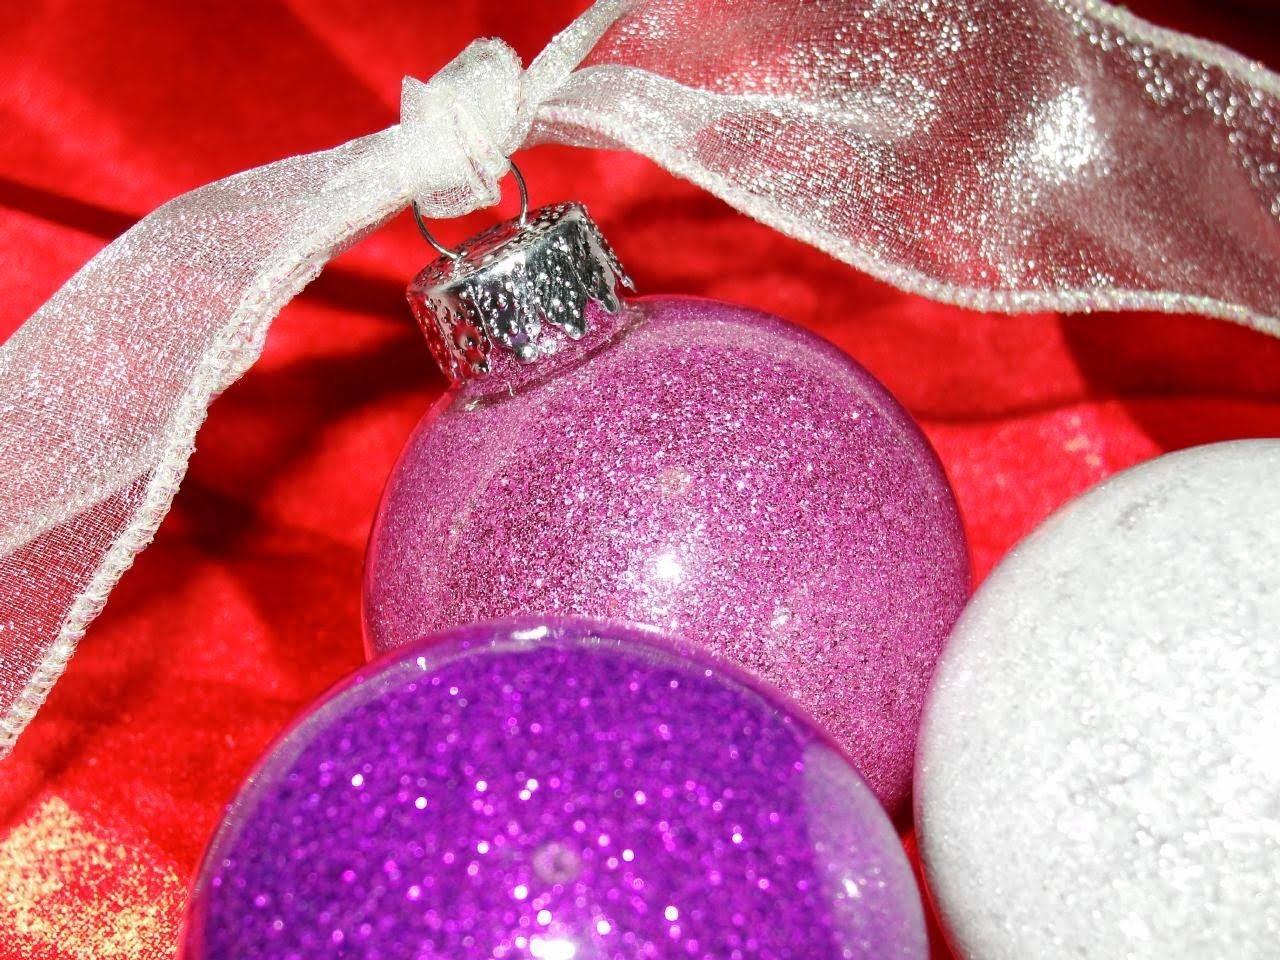 Ornaments made with mop n glow floor polish and super fine glitter ornaments made with mop n glow floor polish and super fine glitter the designer had solutioingenieria Gallery